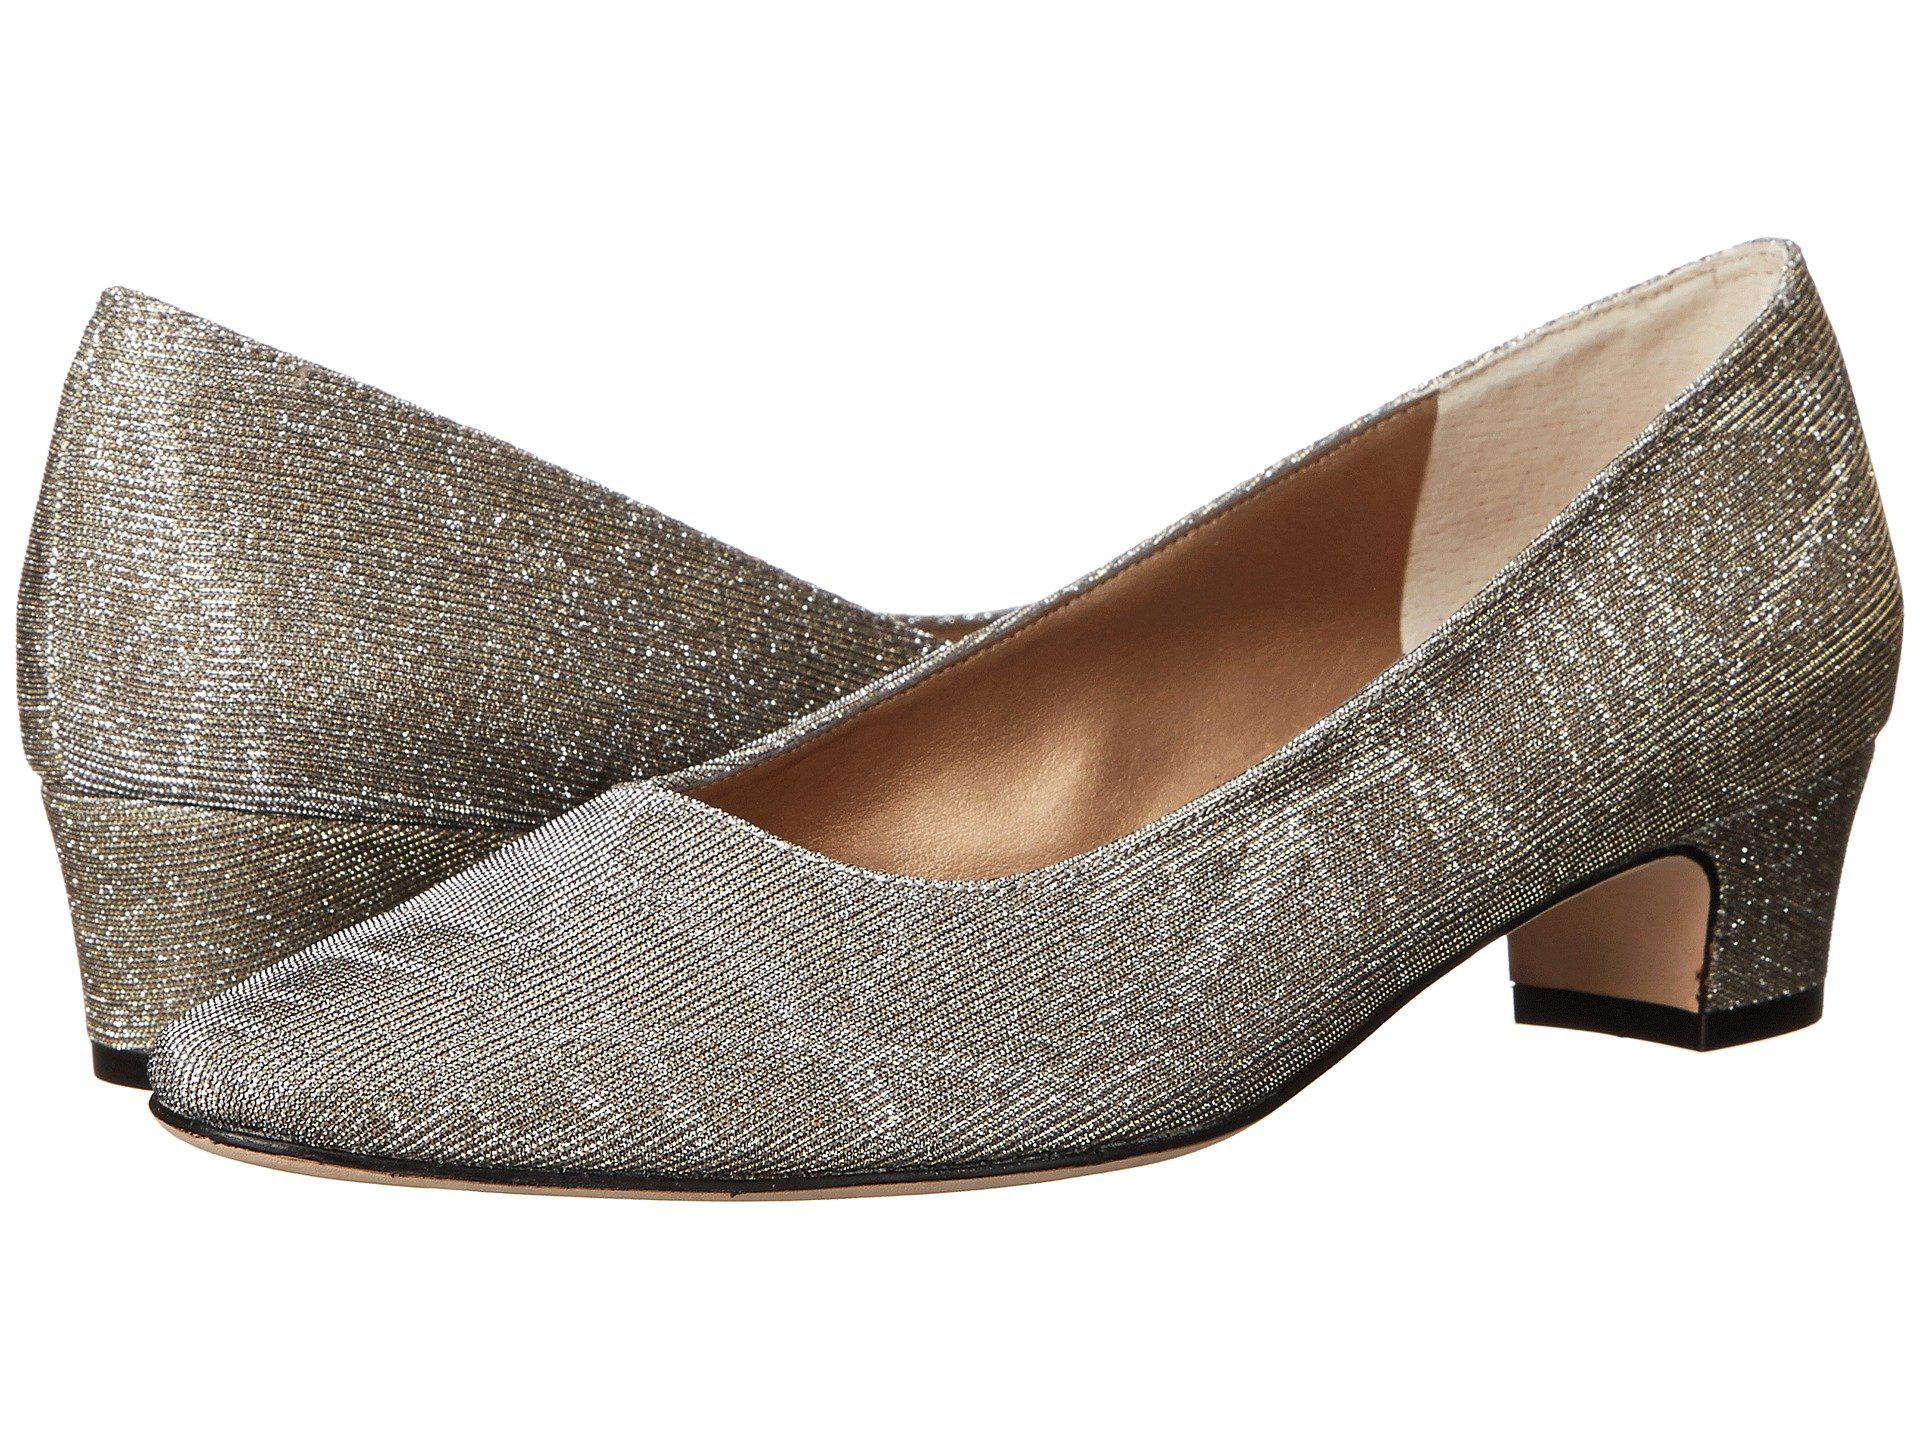 e00ae414d23 Lyst - Vaneli Astyr (platinum Nizza) Women s 1-2 Inch Heel Shoes in ...